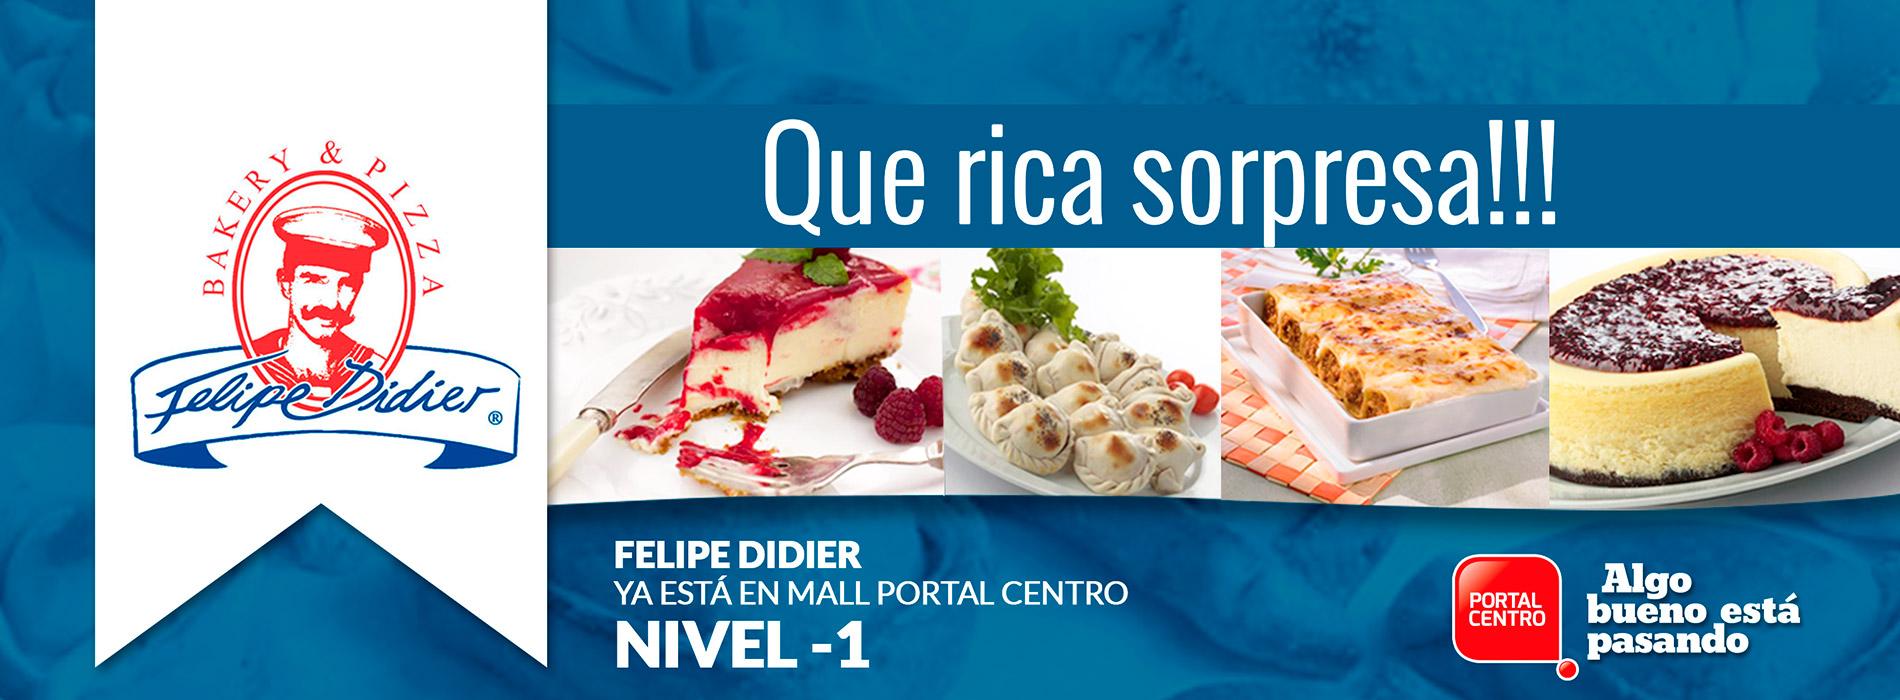 Banner_web_felipe_didier-1